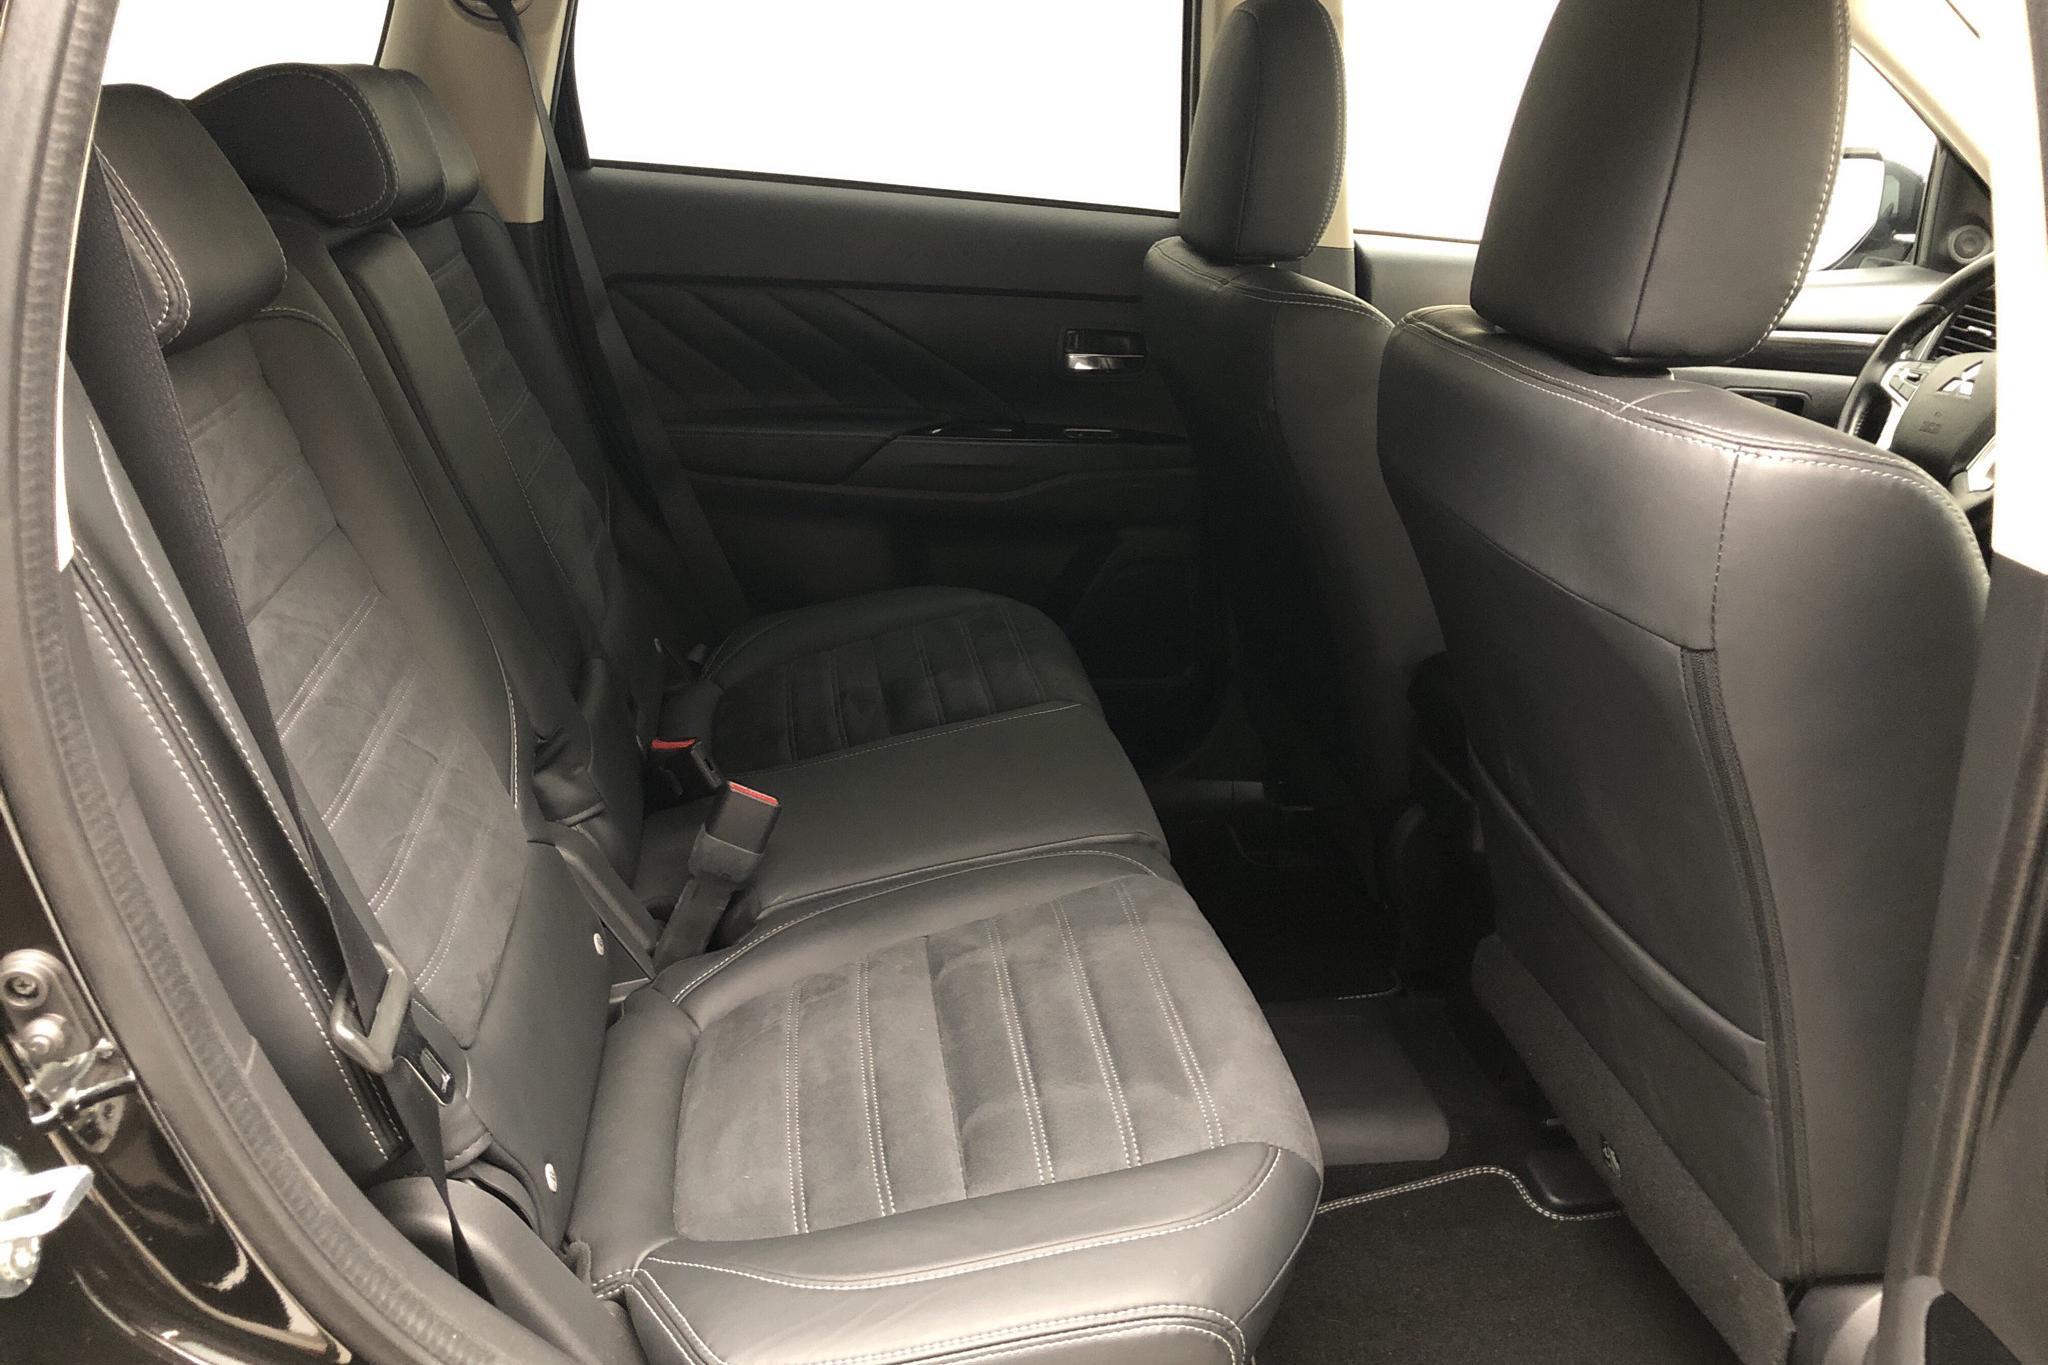 Mitsubishi Outlander 2.0 Plug-in Hybrid 4WD (121hk) - 1 025 mil - Automat - svart - 2017